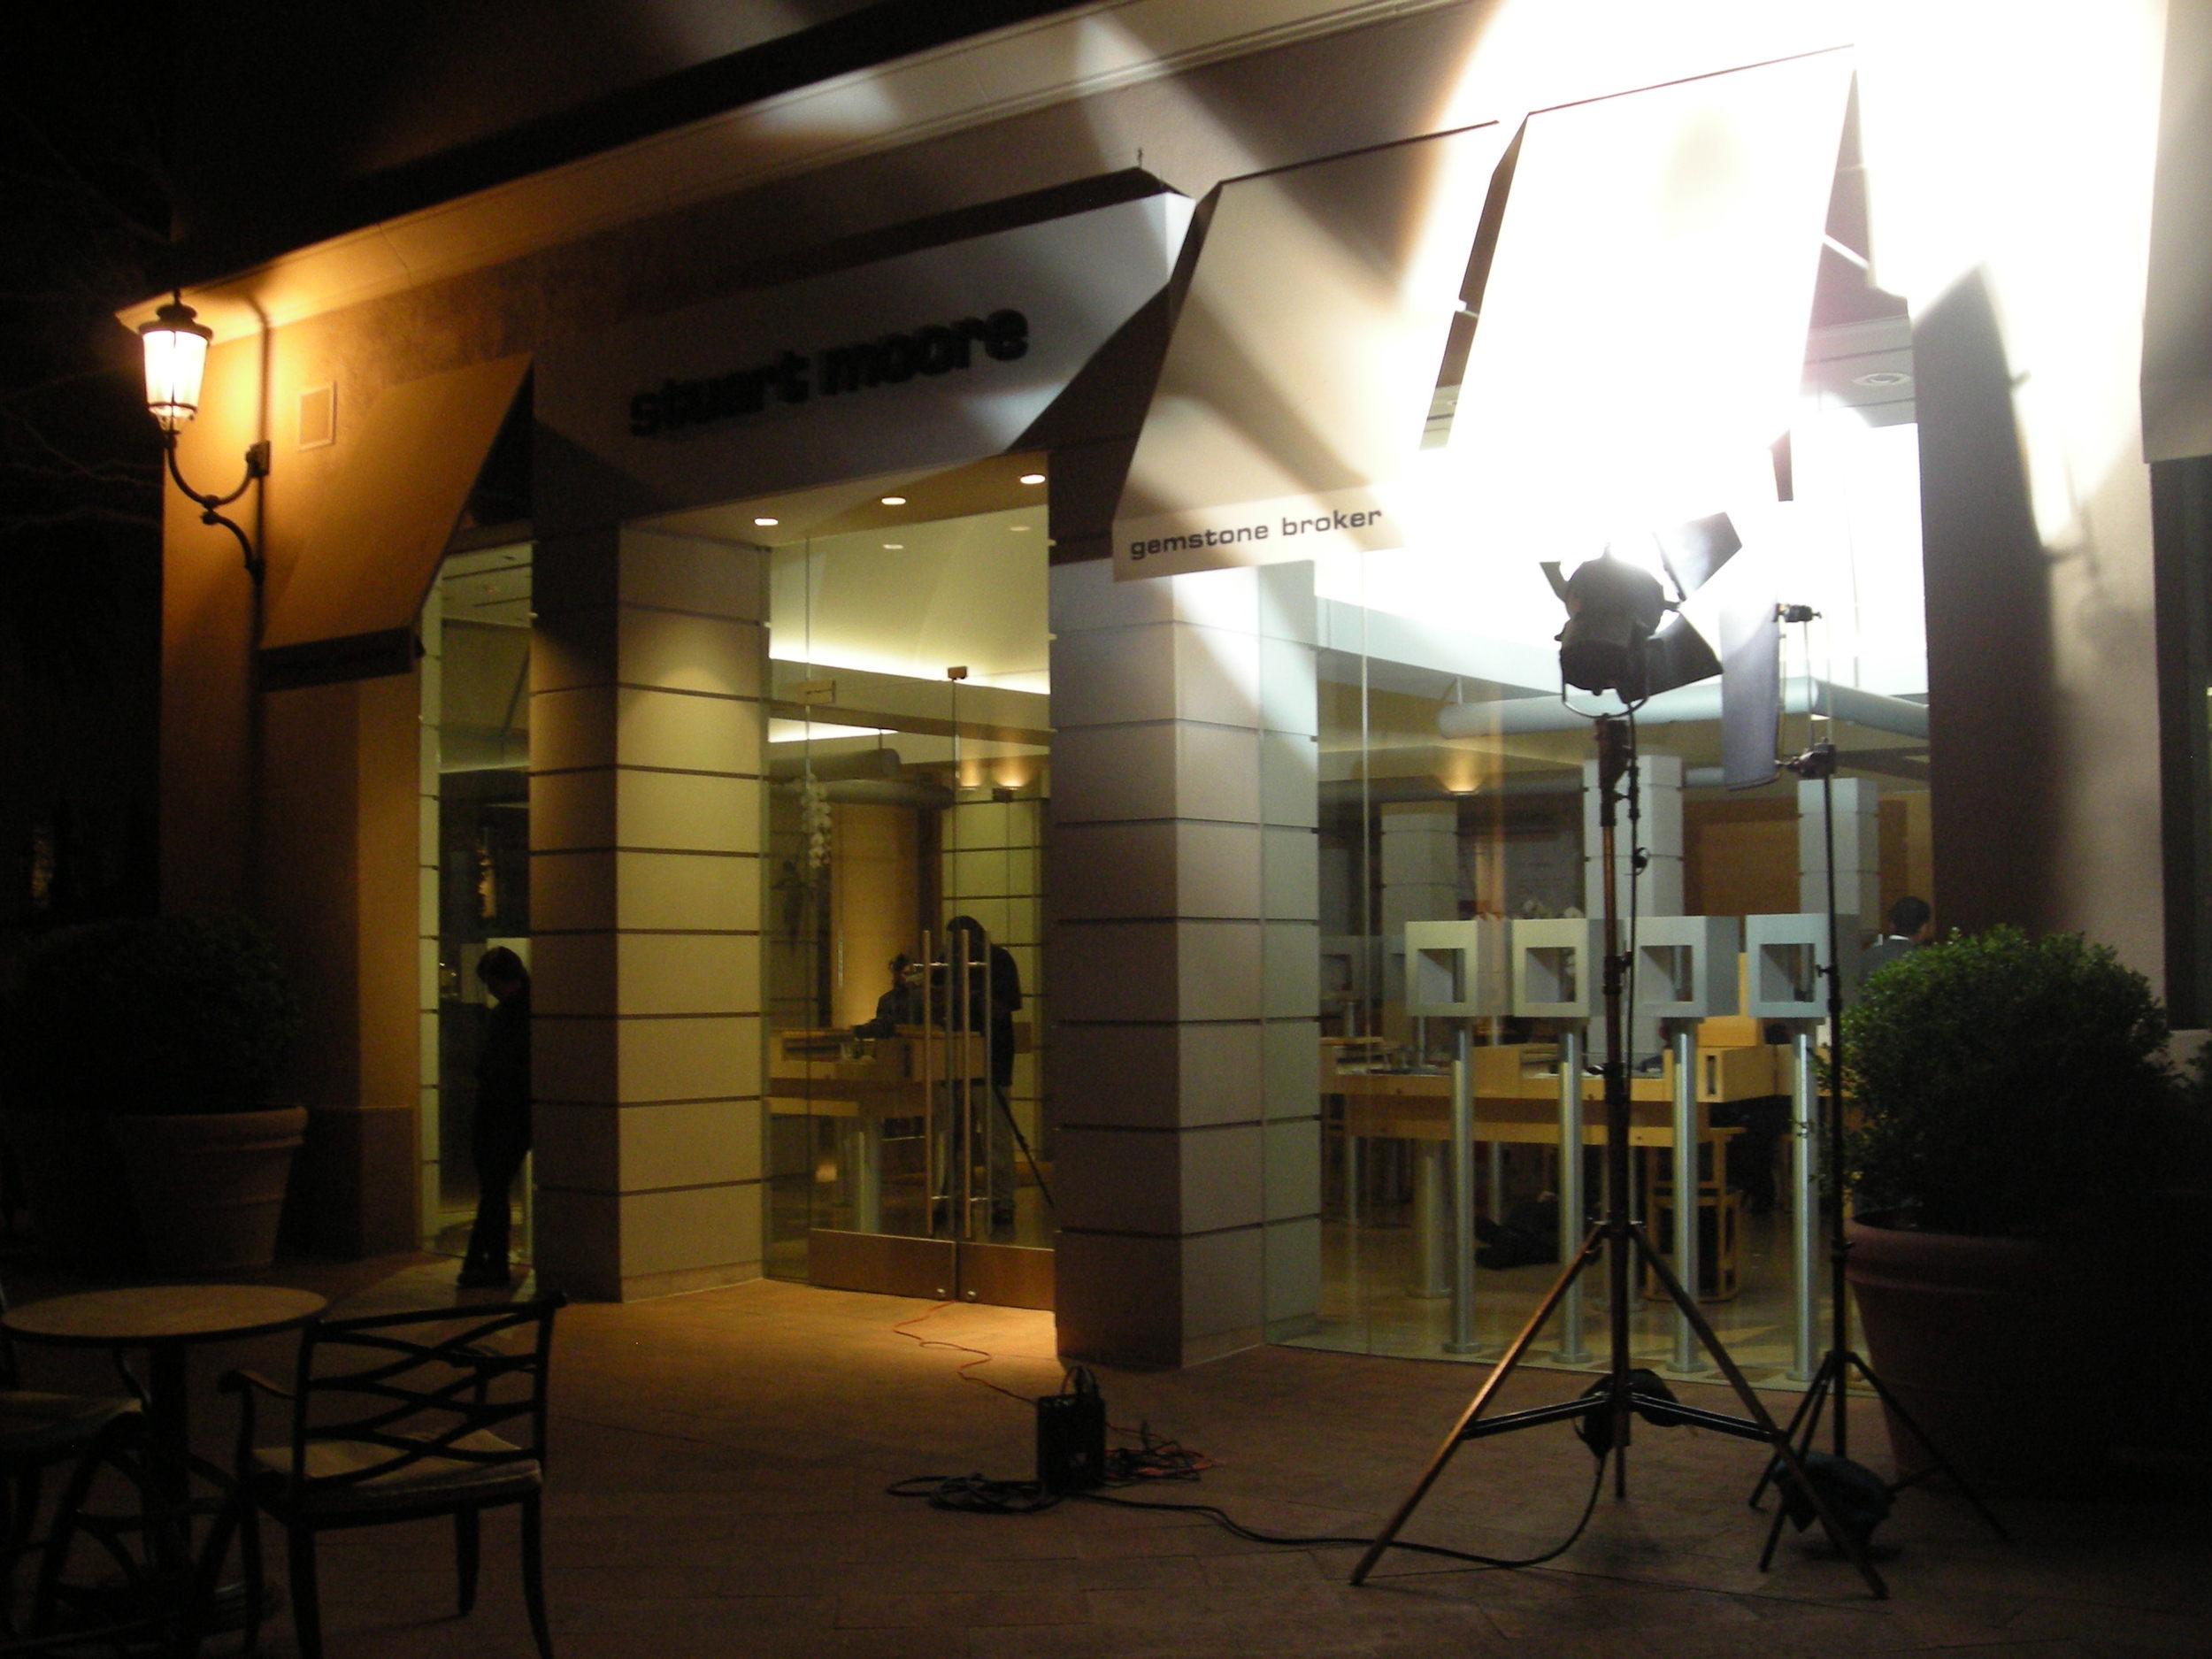 Kobold HMI Lights used for 5D Shoot